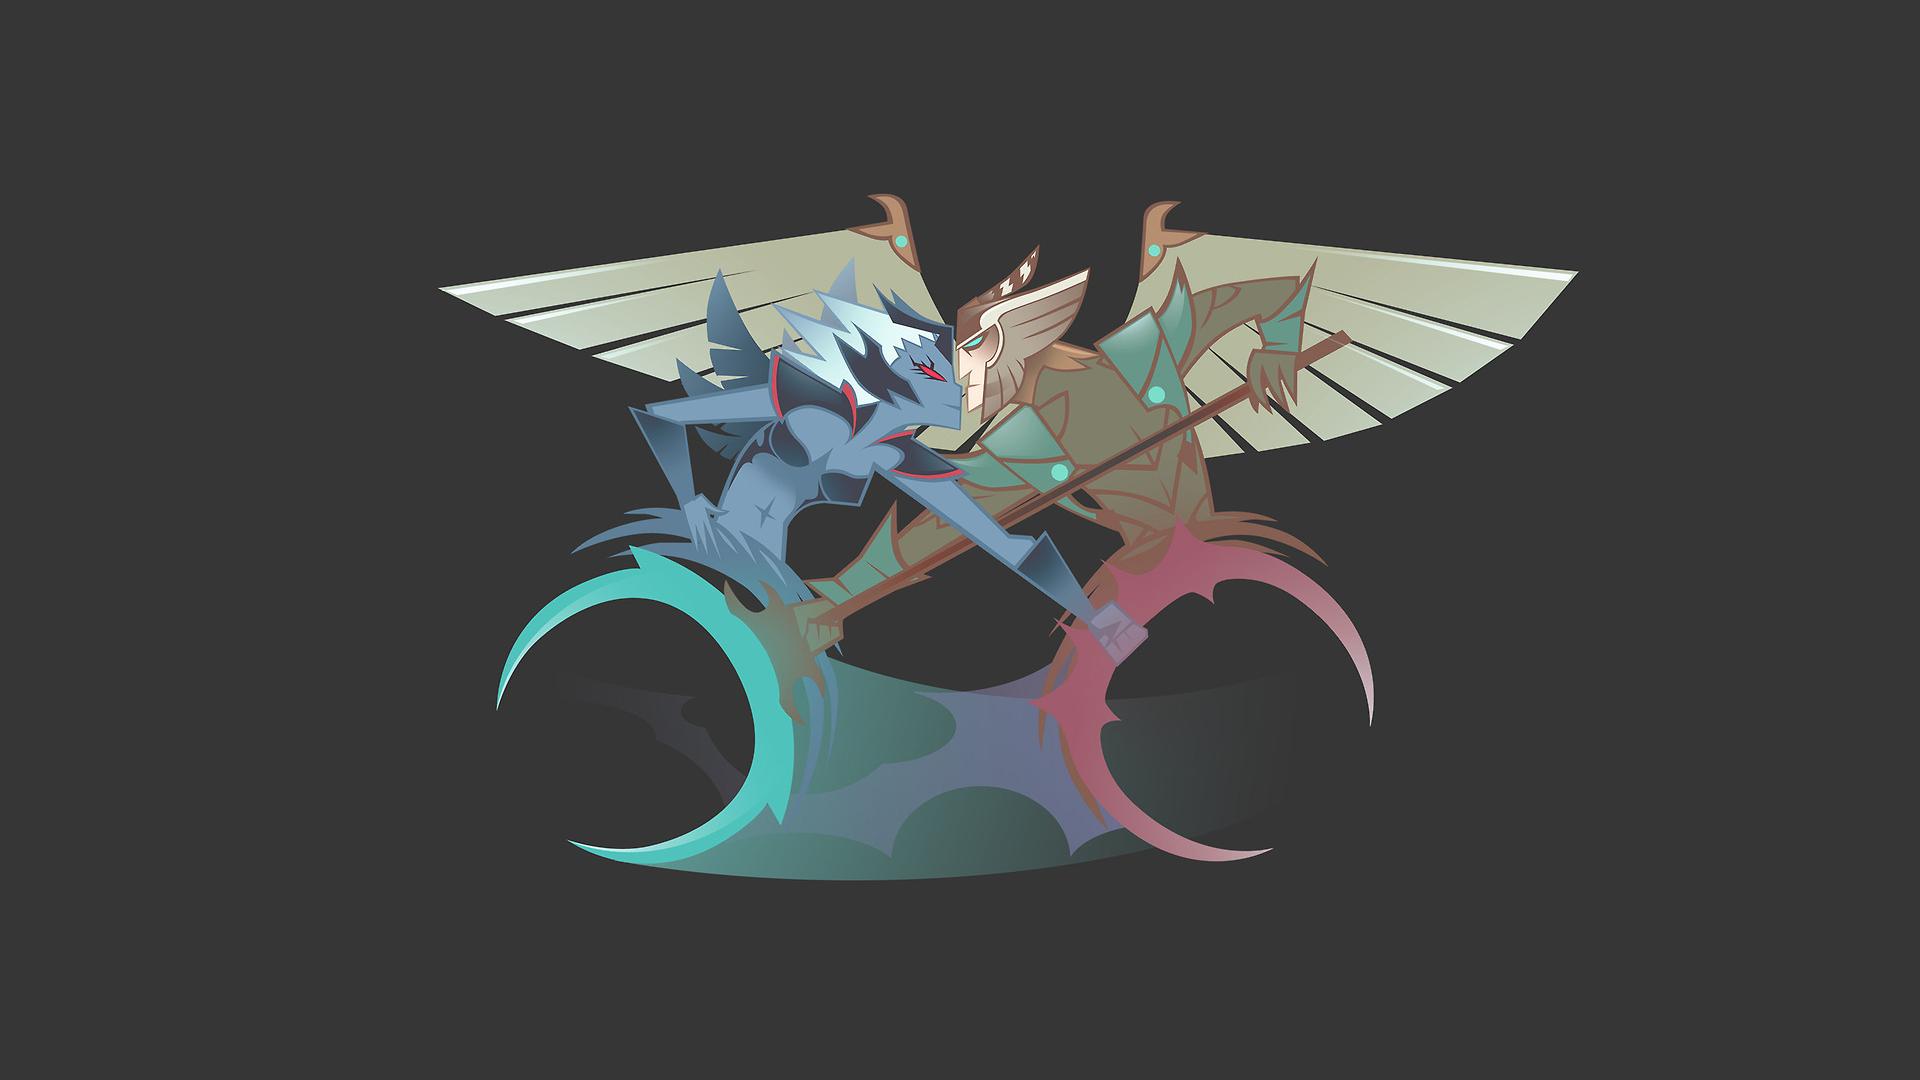 Skywrath Mage And Vengeful Spirit By Loussiry On Tumblr